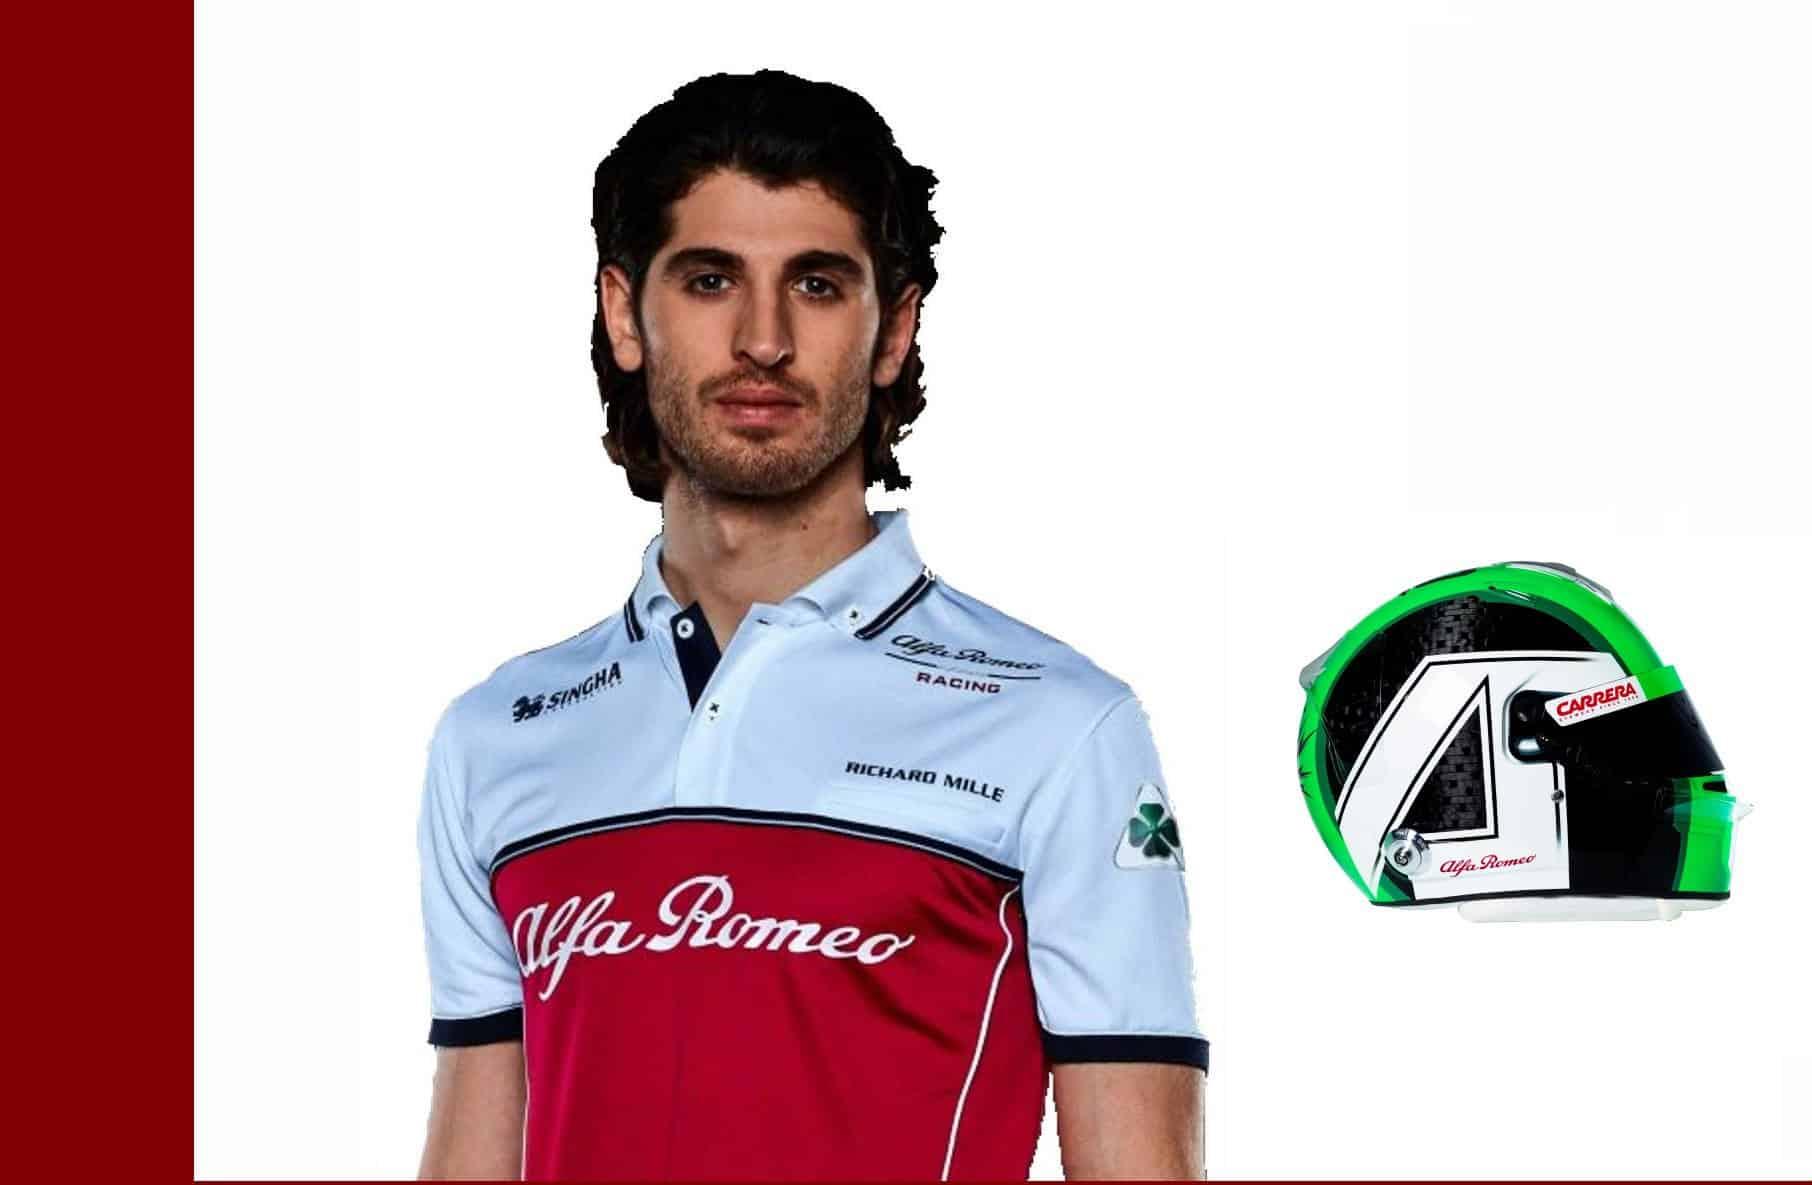 Antonio-Giovinazzi-Alfa-Romeo-Racing_profil_velika-2019 helmet